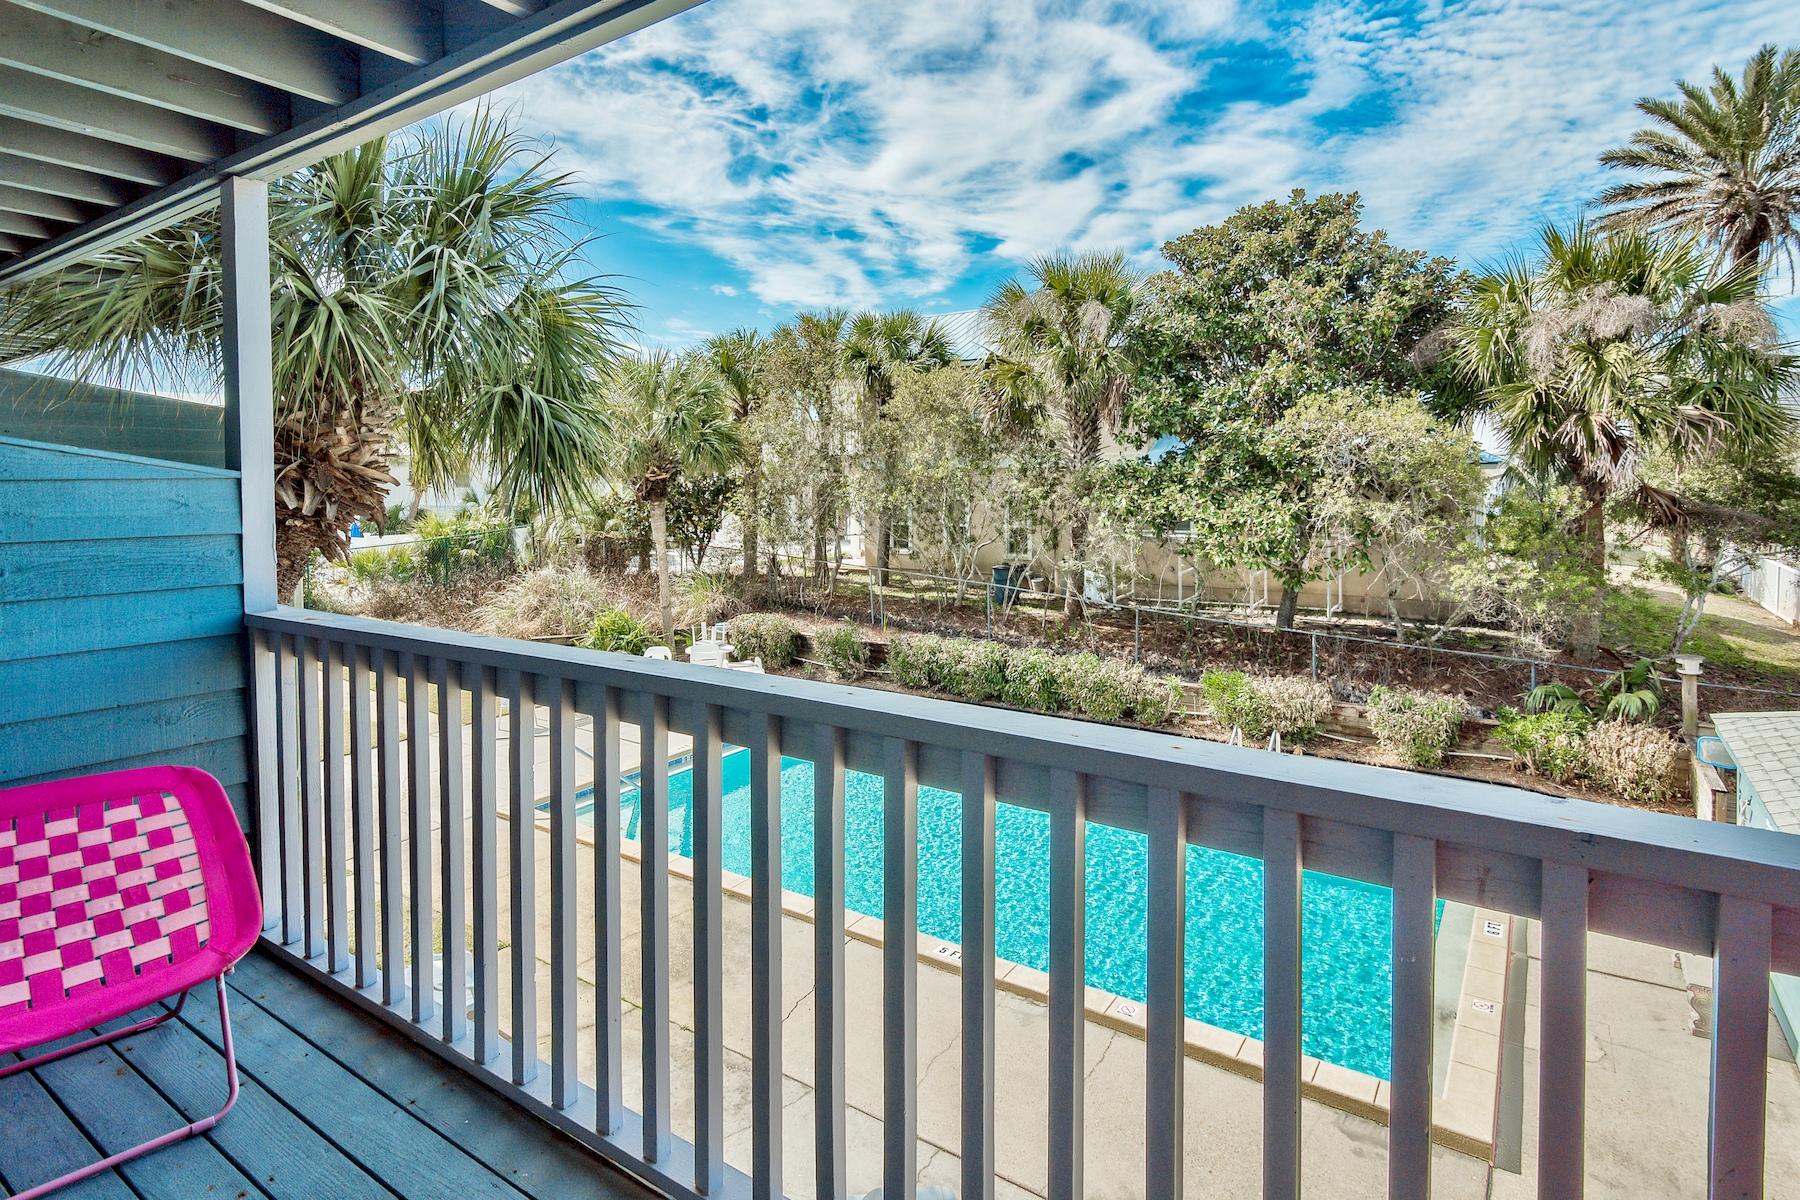 Кондоминиум для того Продажа на Charming Condo Steps From the Beach 126 S Walton Lakeshore Drive Unit 205, Inlet Beach, Флорида, 32461 Соединенные Штаты